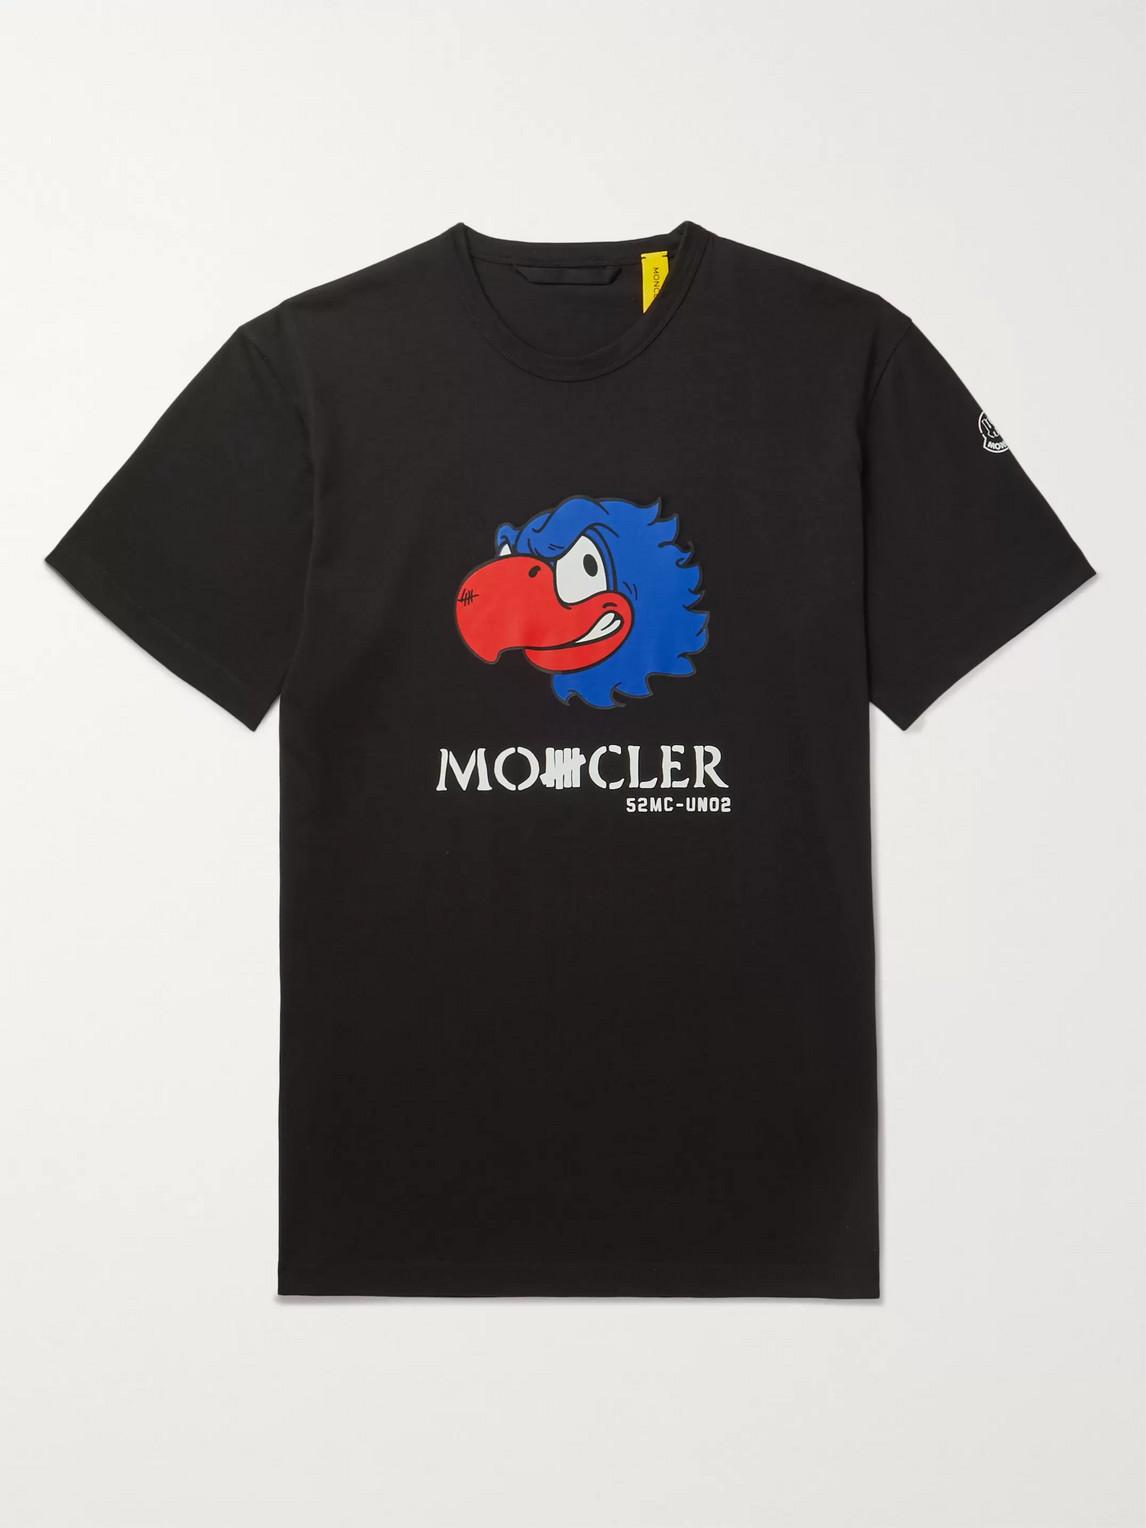 Moncler Genius Cottons UNDEFEATED 2 MONCLER 1952 LOGO-PRINT COTTON-JERSEY T-SHIRT